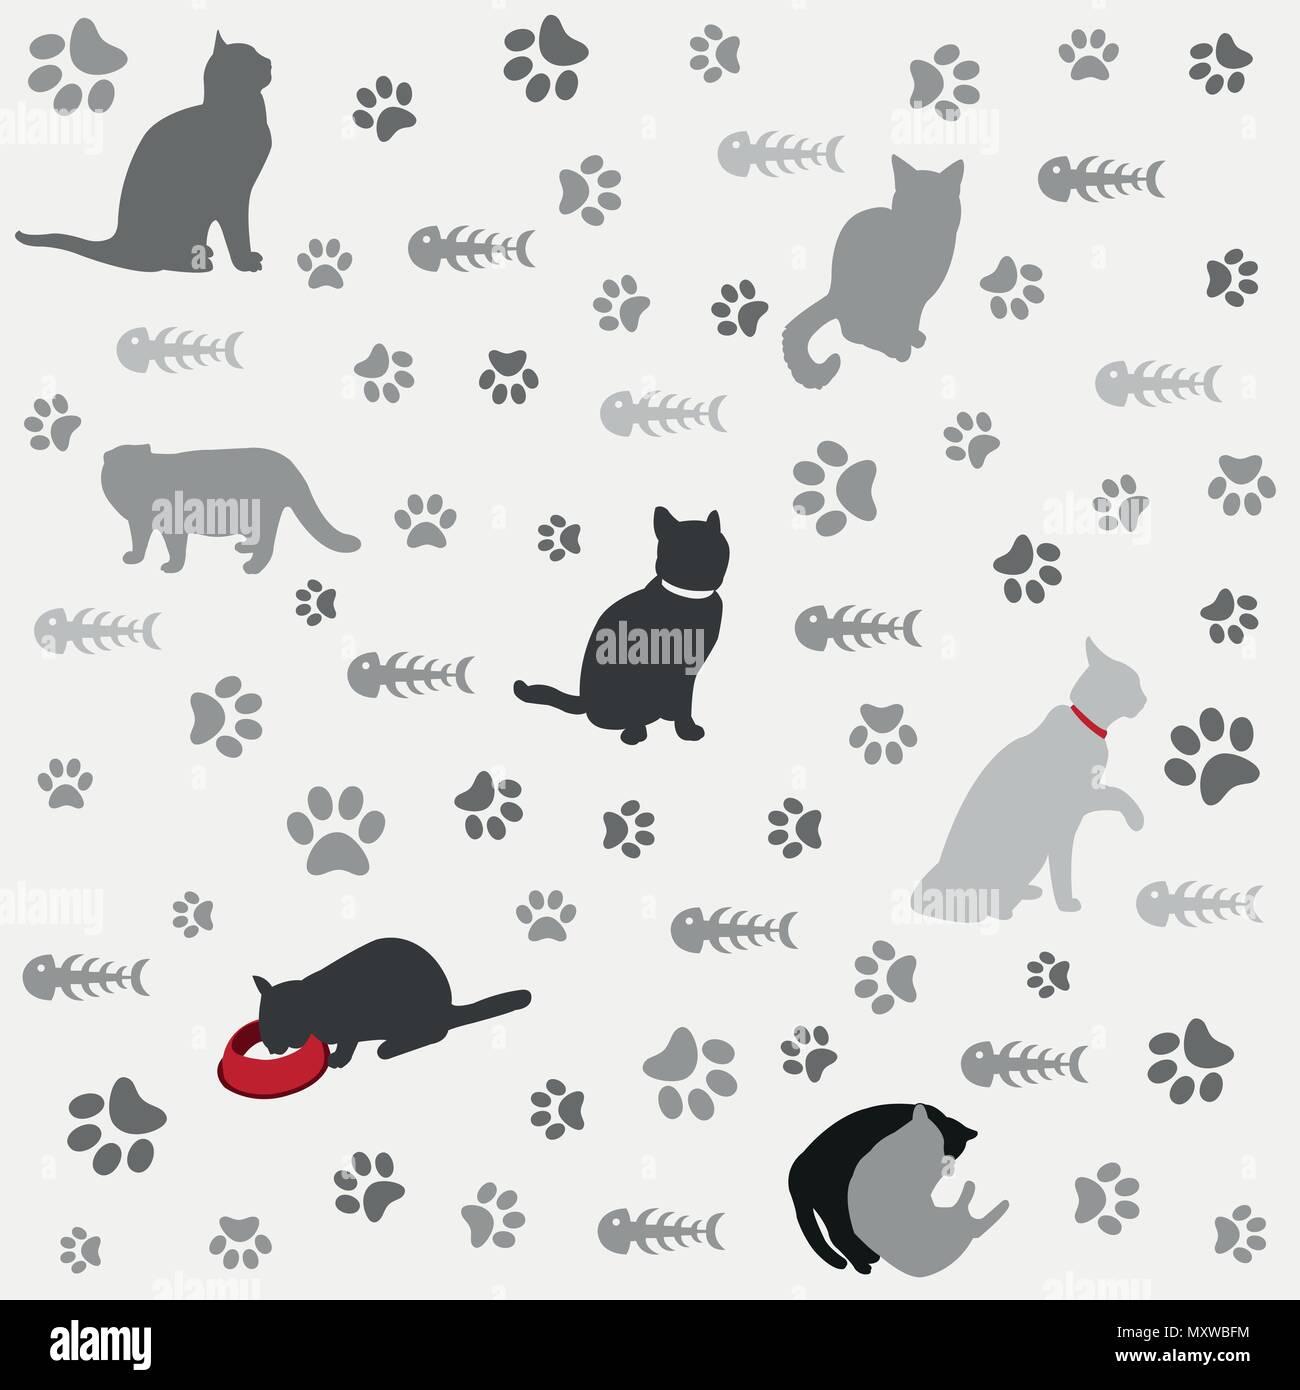 Cat Paw Print Stock Photos & Cat Paw Print Stock Images - Alamy